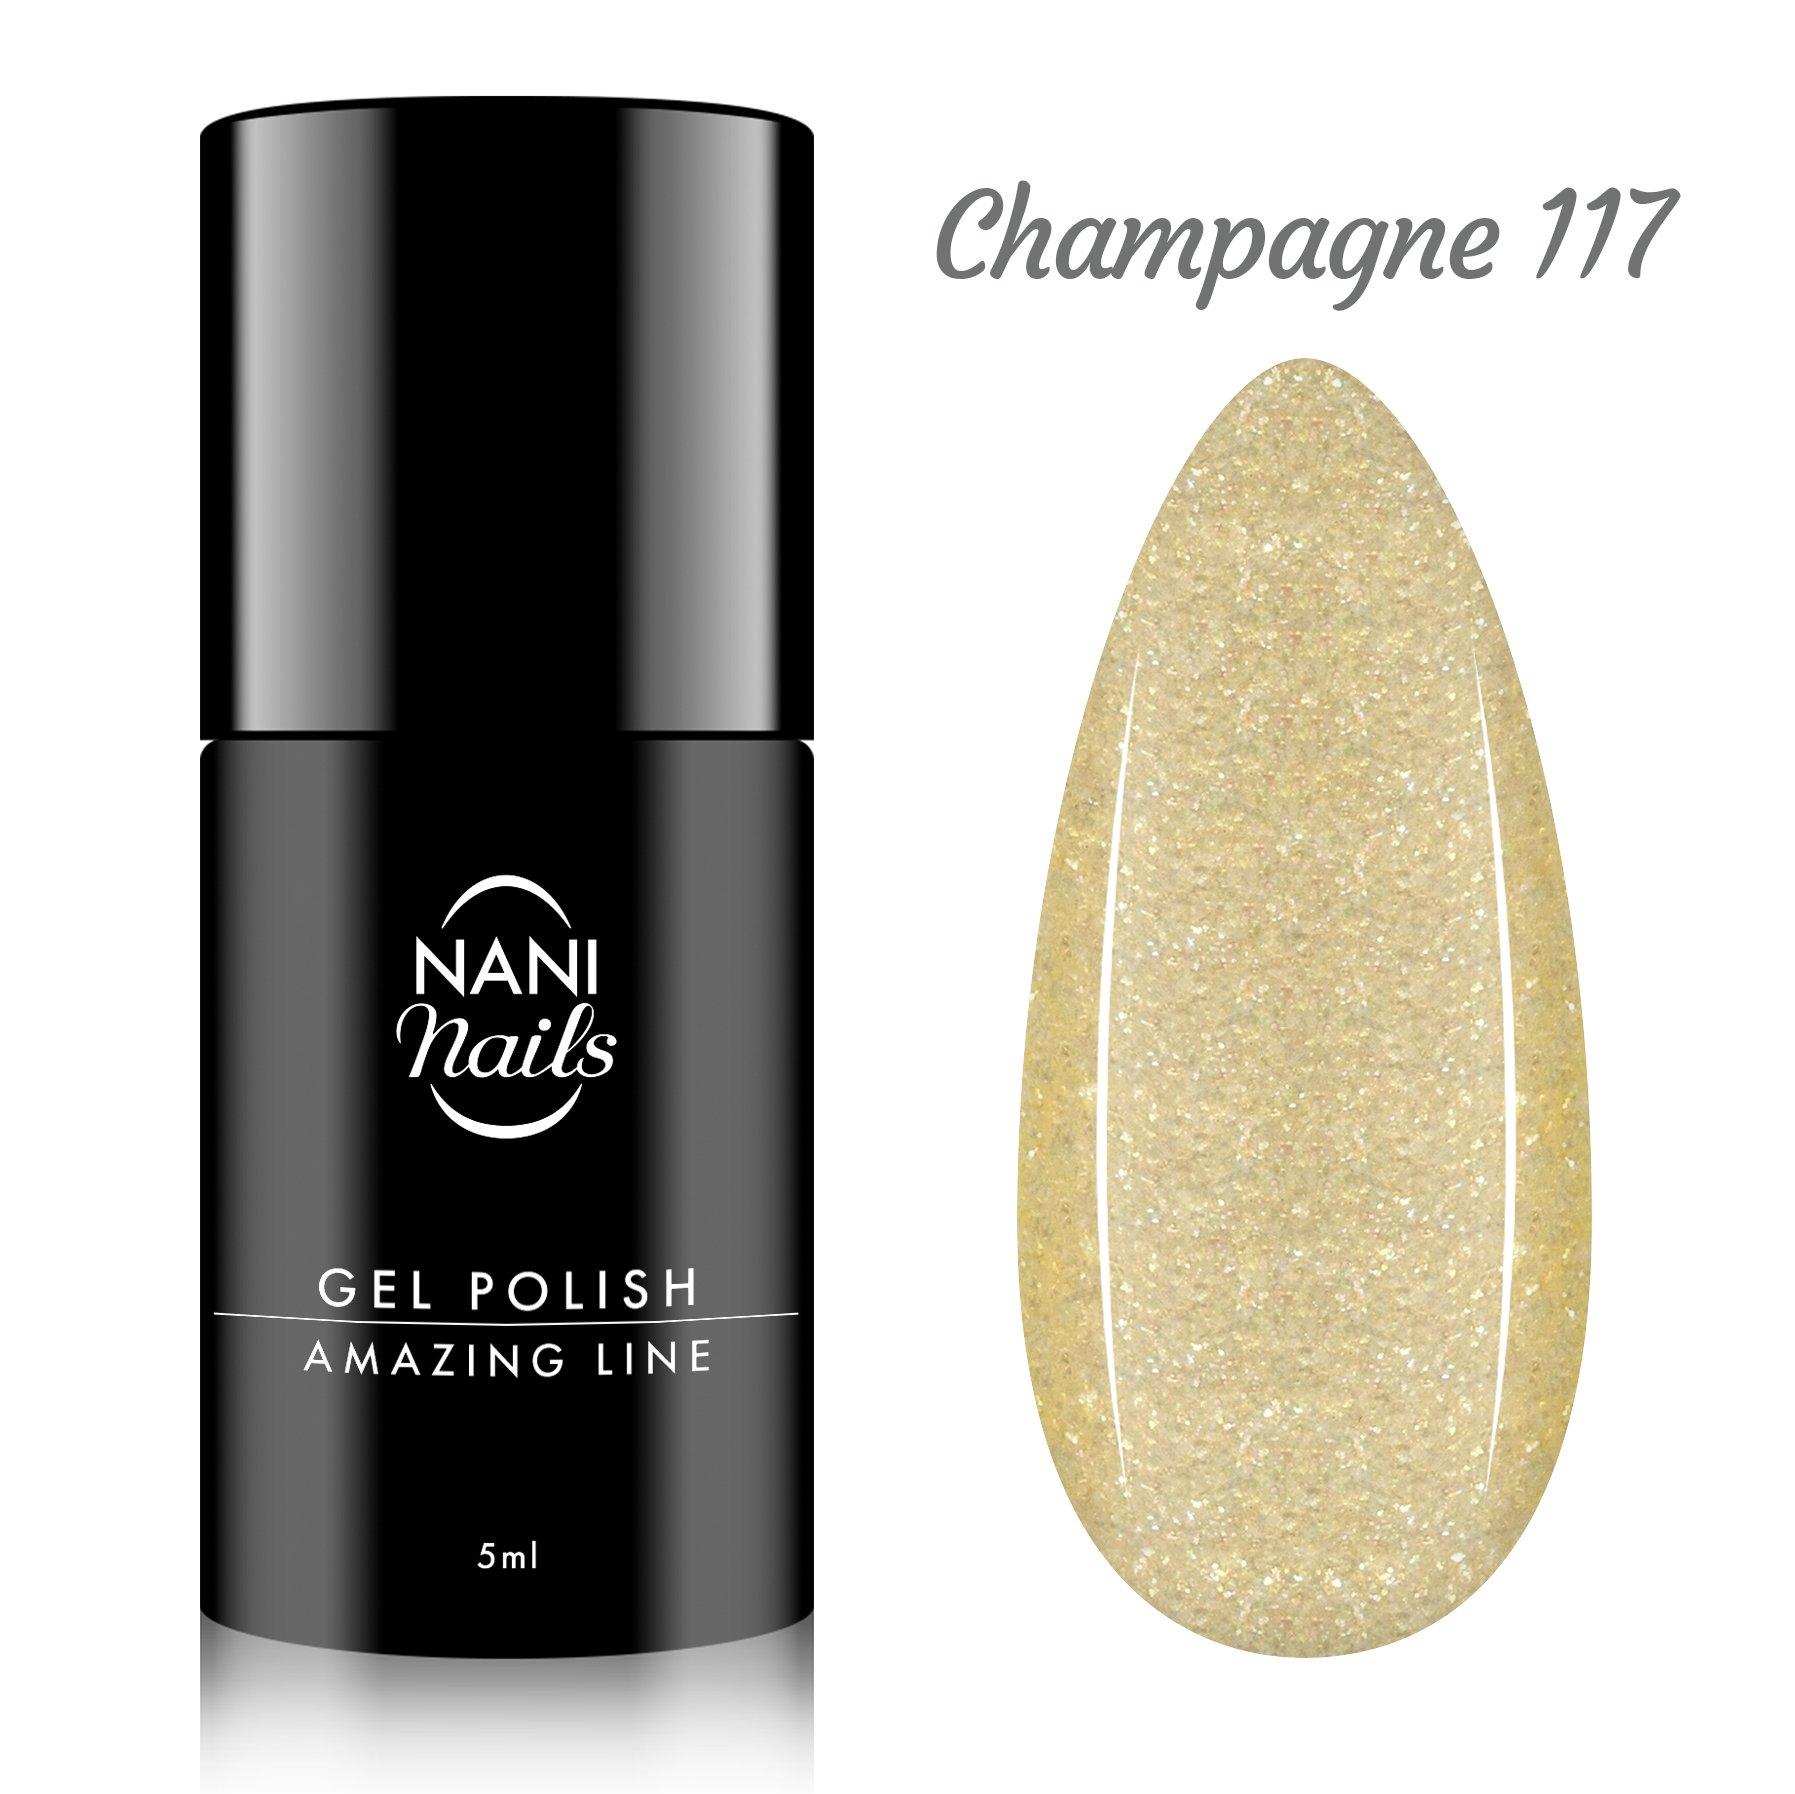 NANI gel lak Amazing Line 5 ml - Champagne